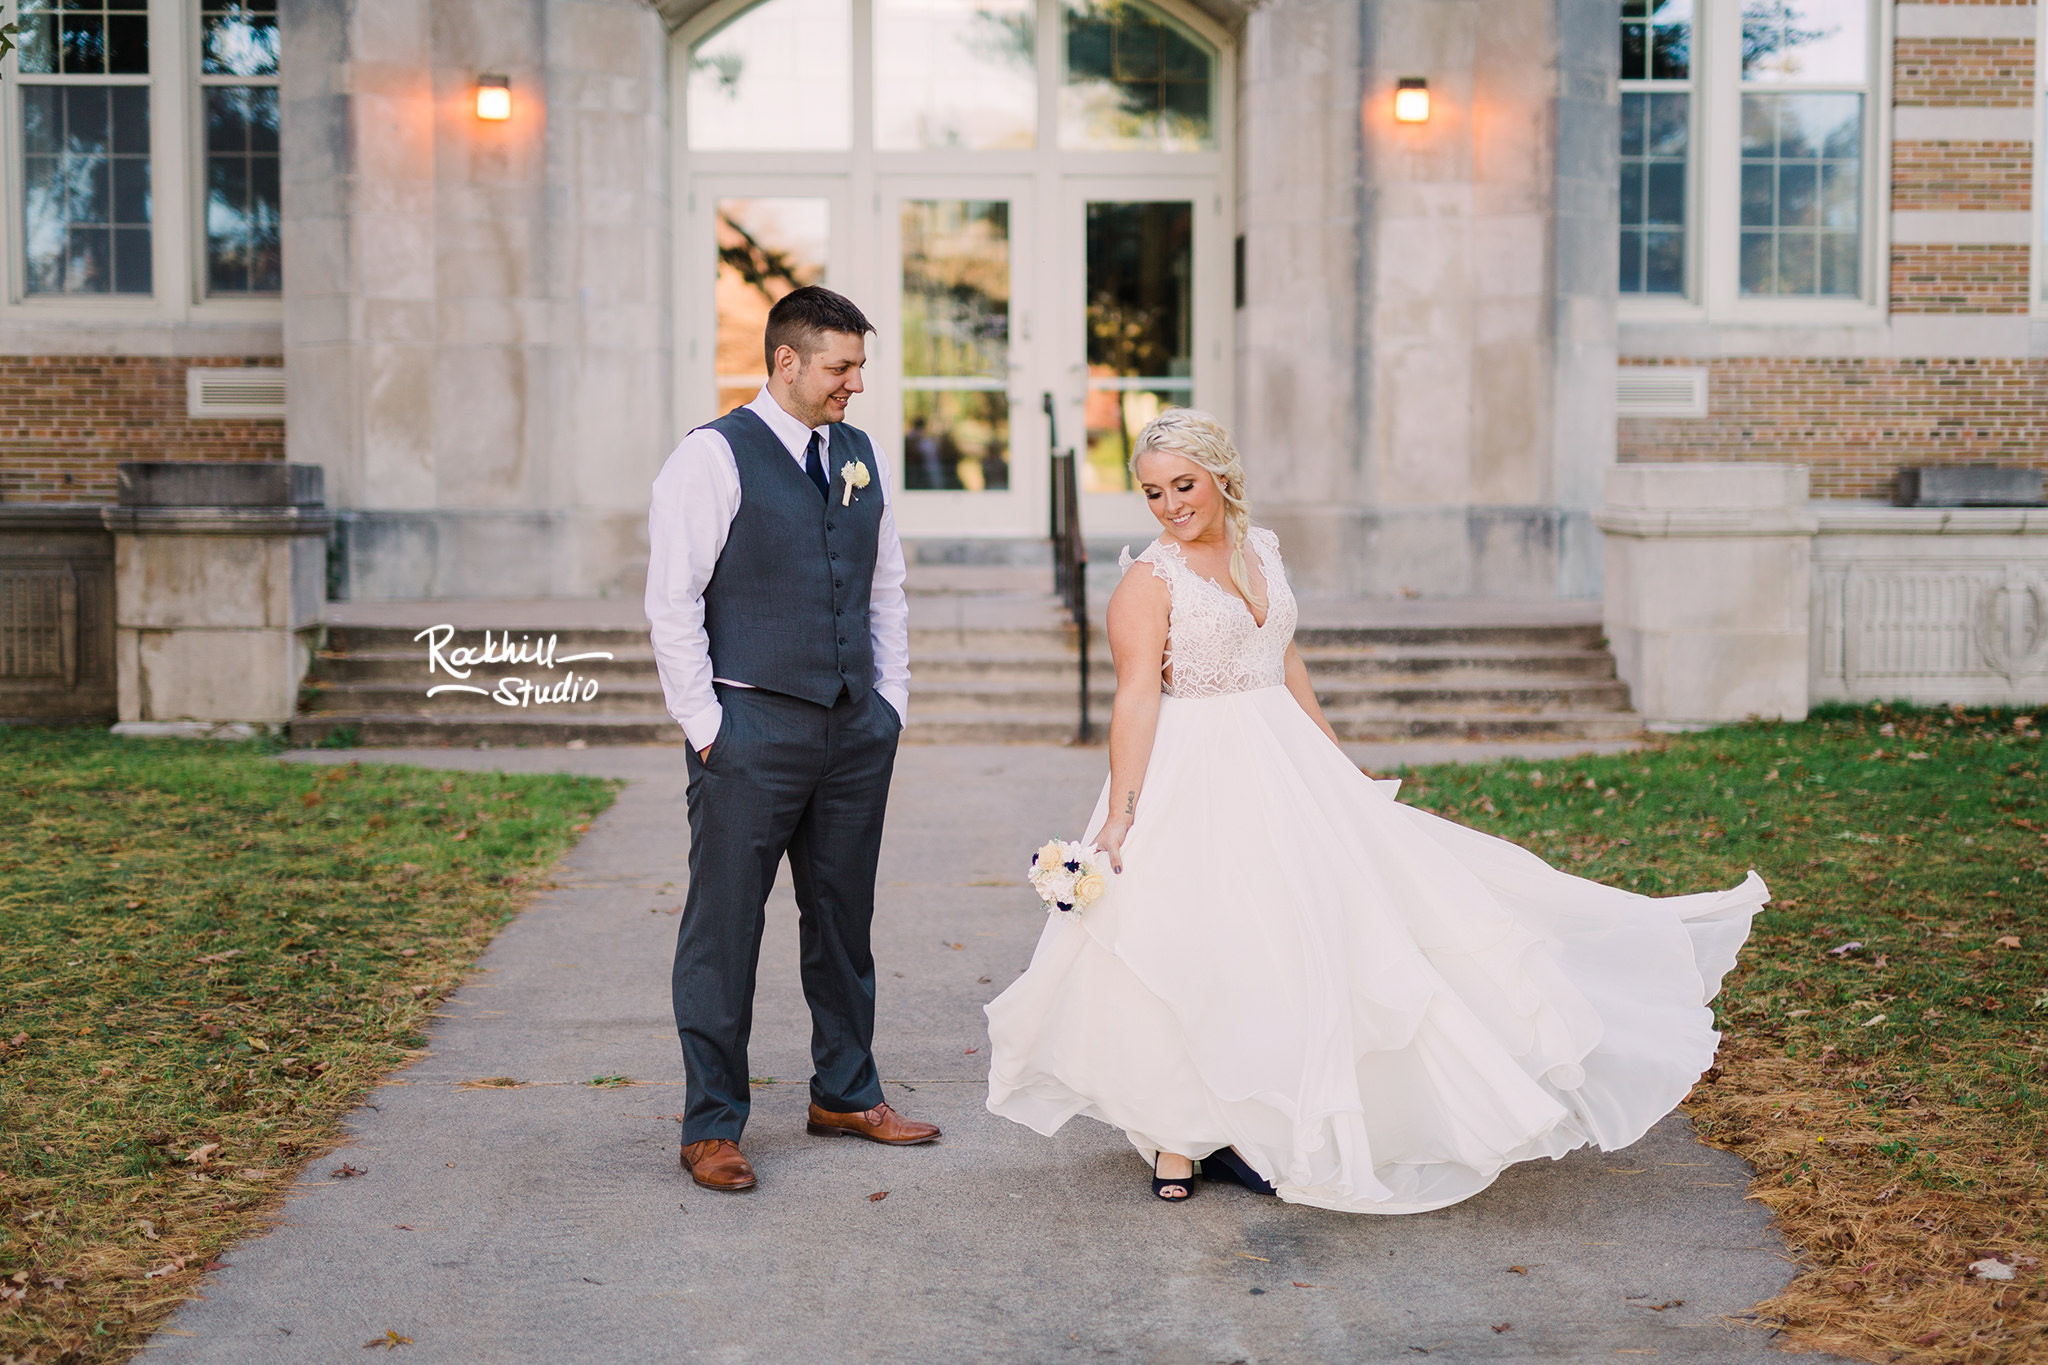 Traverse_city_wedding_photographer_michigan_rockhill_studio_getting_ready_QD_41.jpg